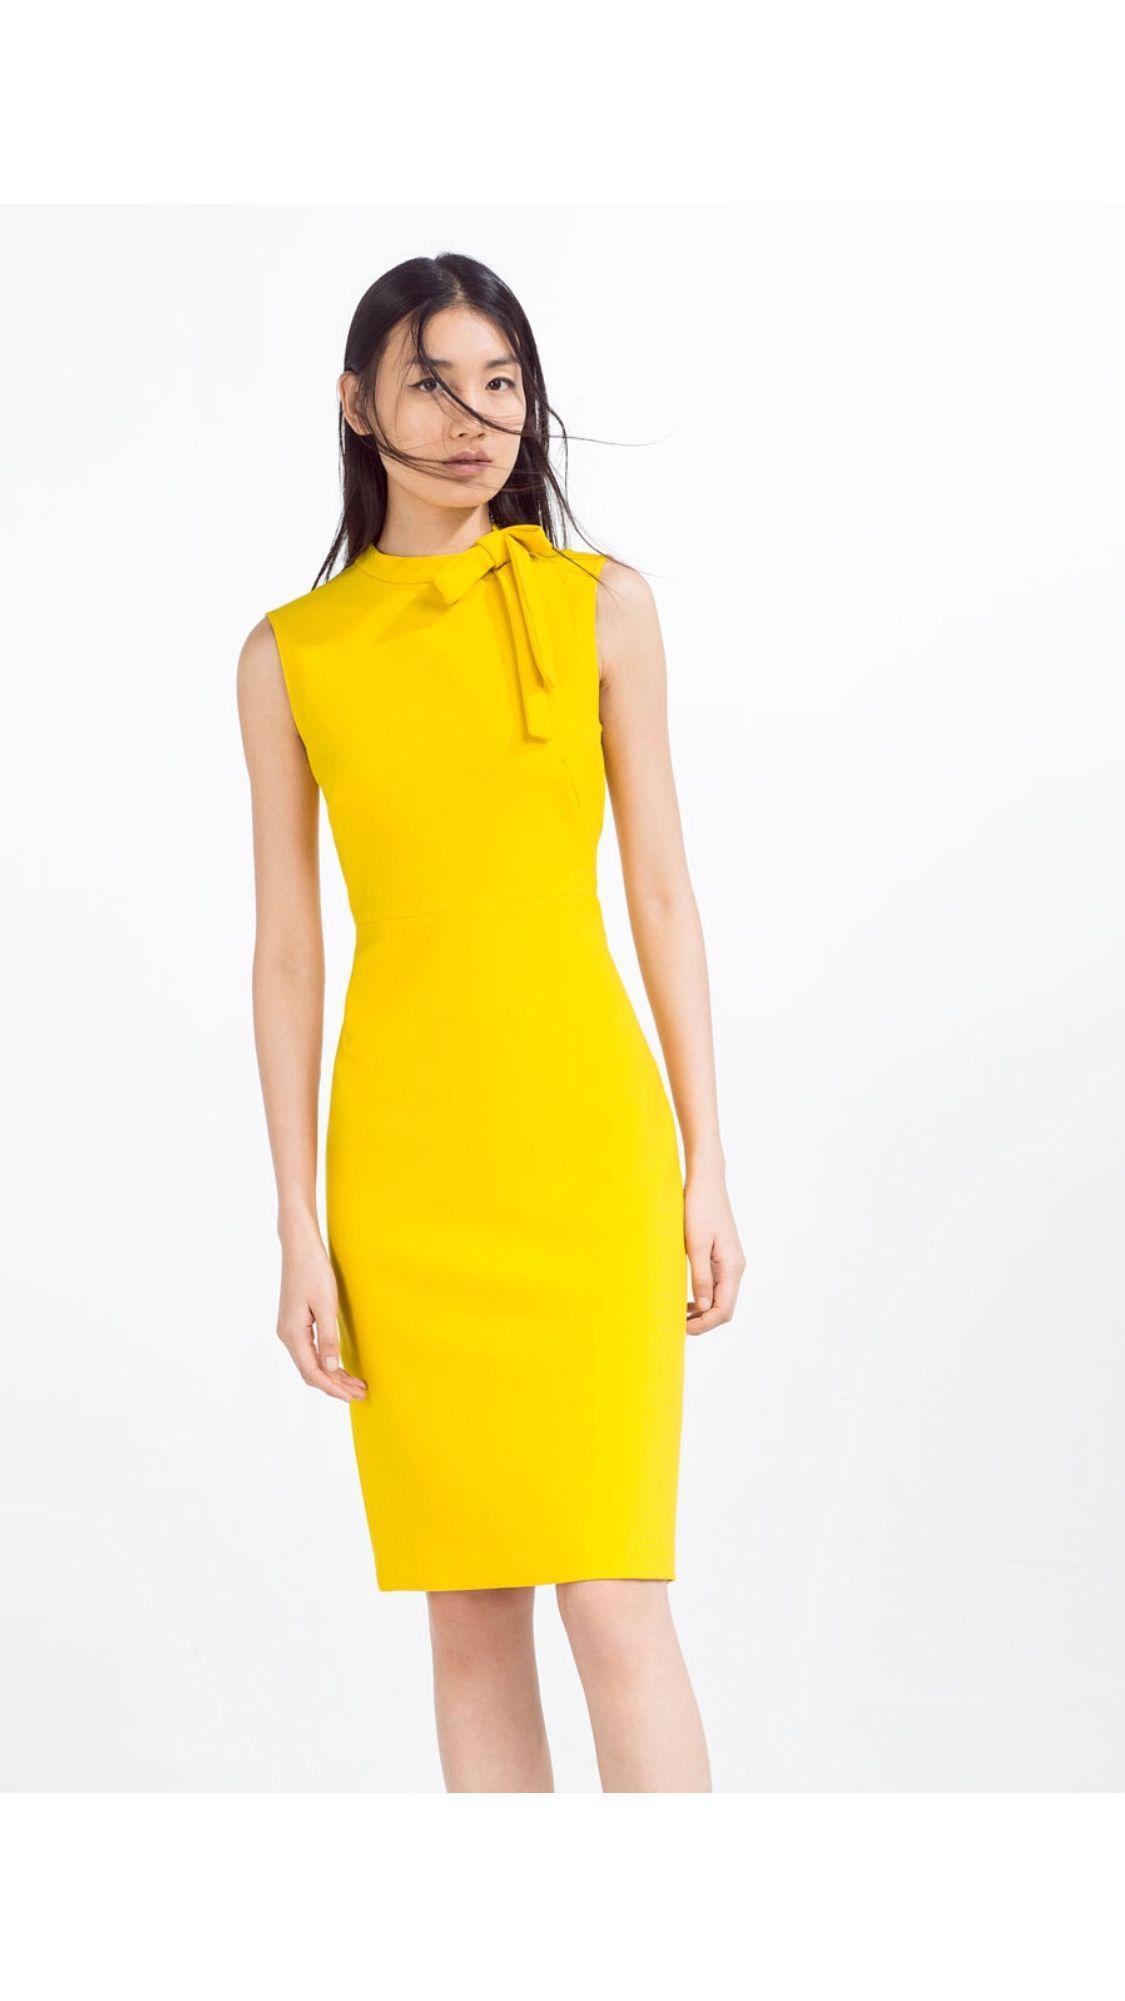 Zara Yellow Dress Tube Dress Celebrity Dresses White Tube Dress [ 2001 x 1125 Pixel ]